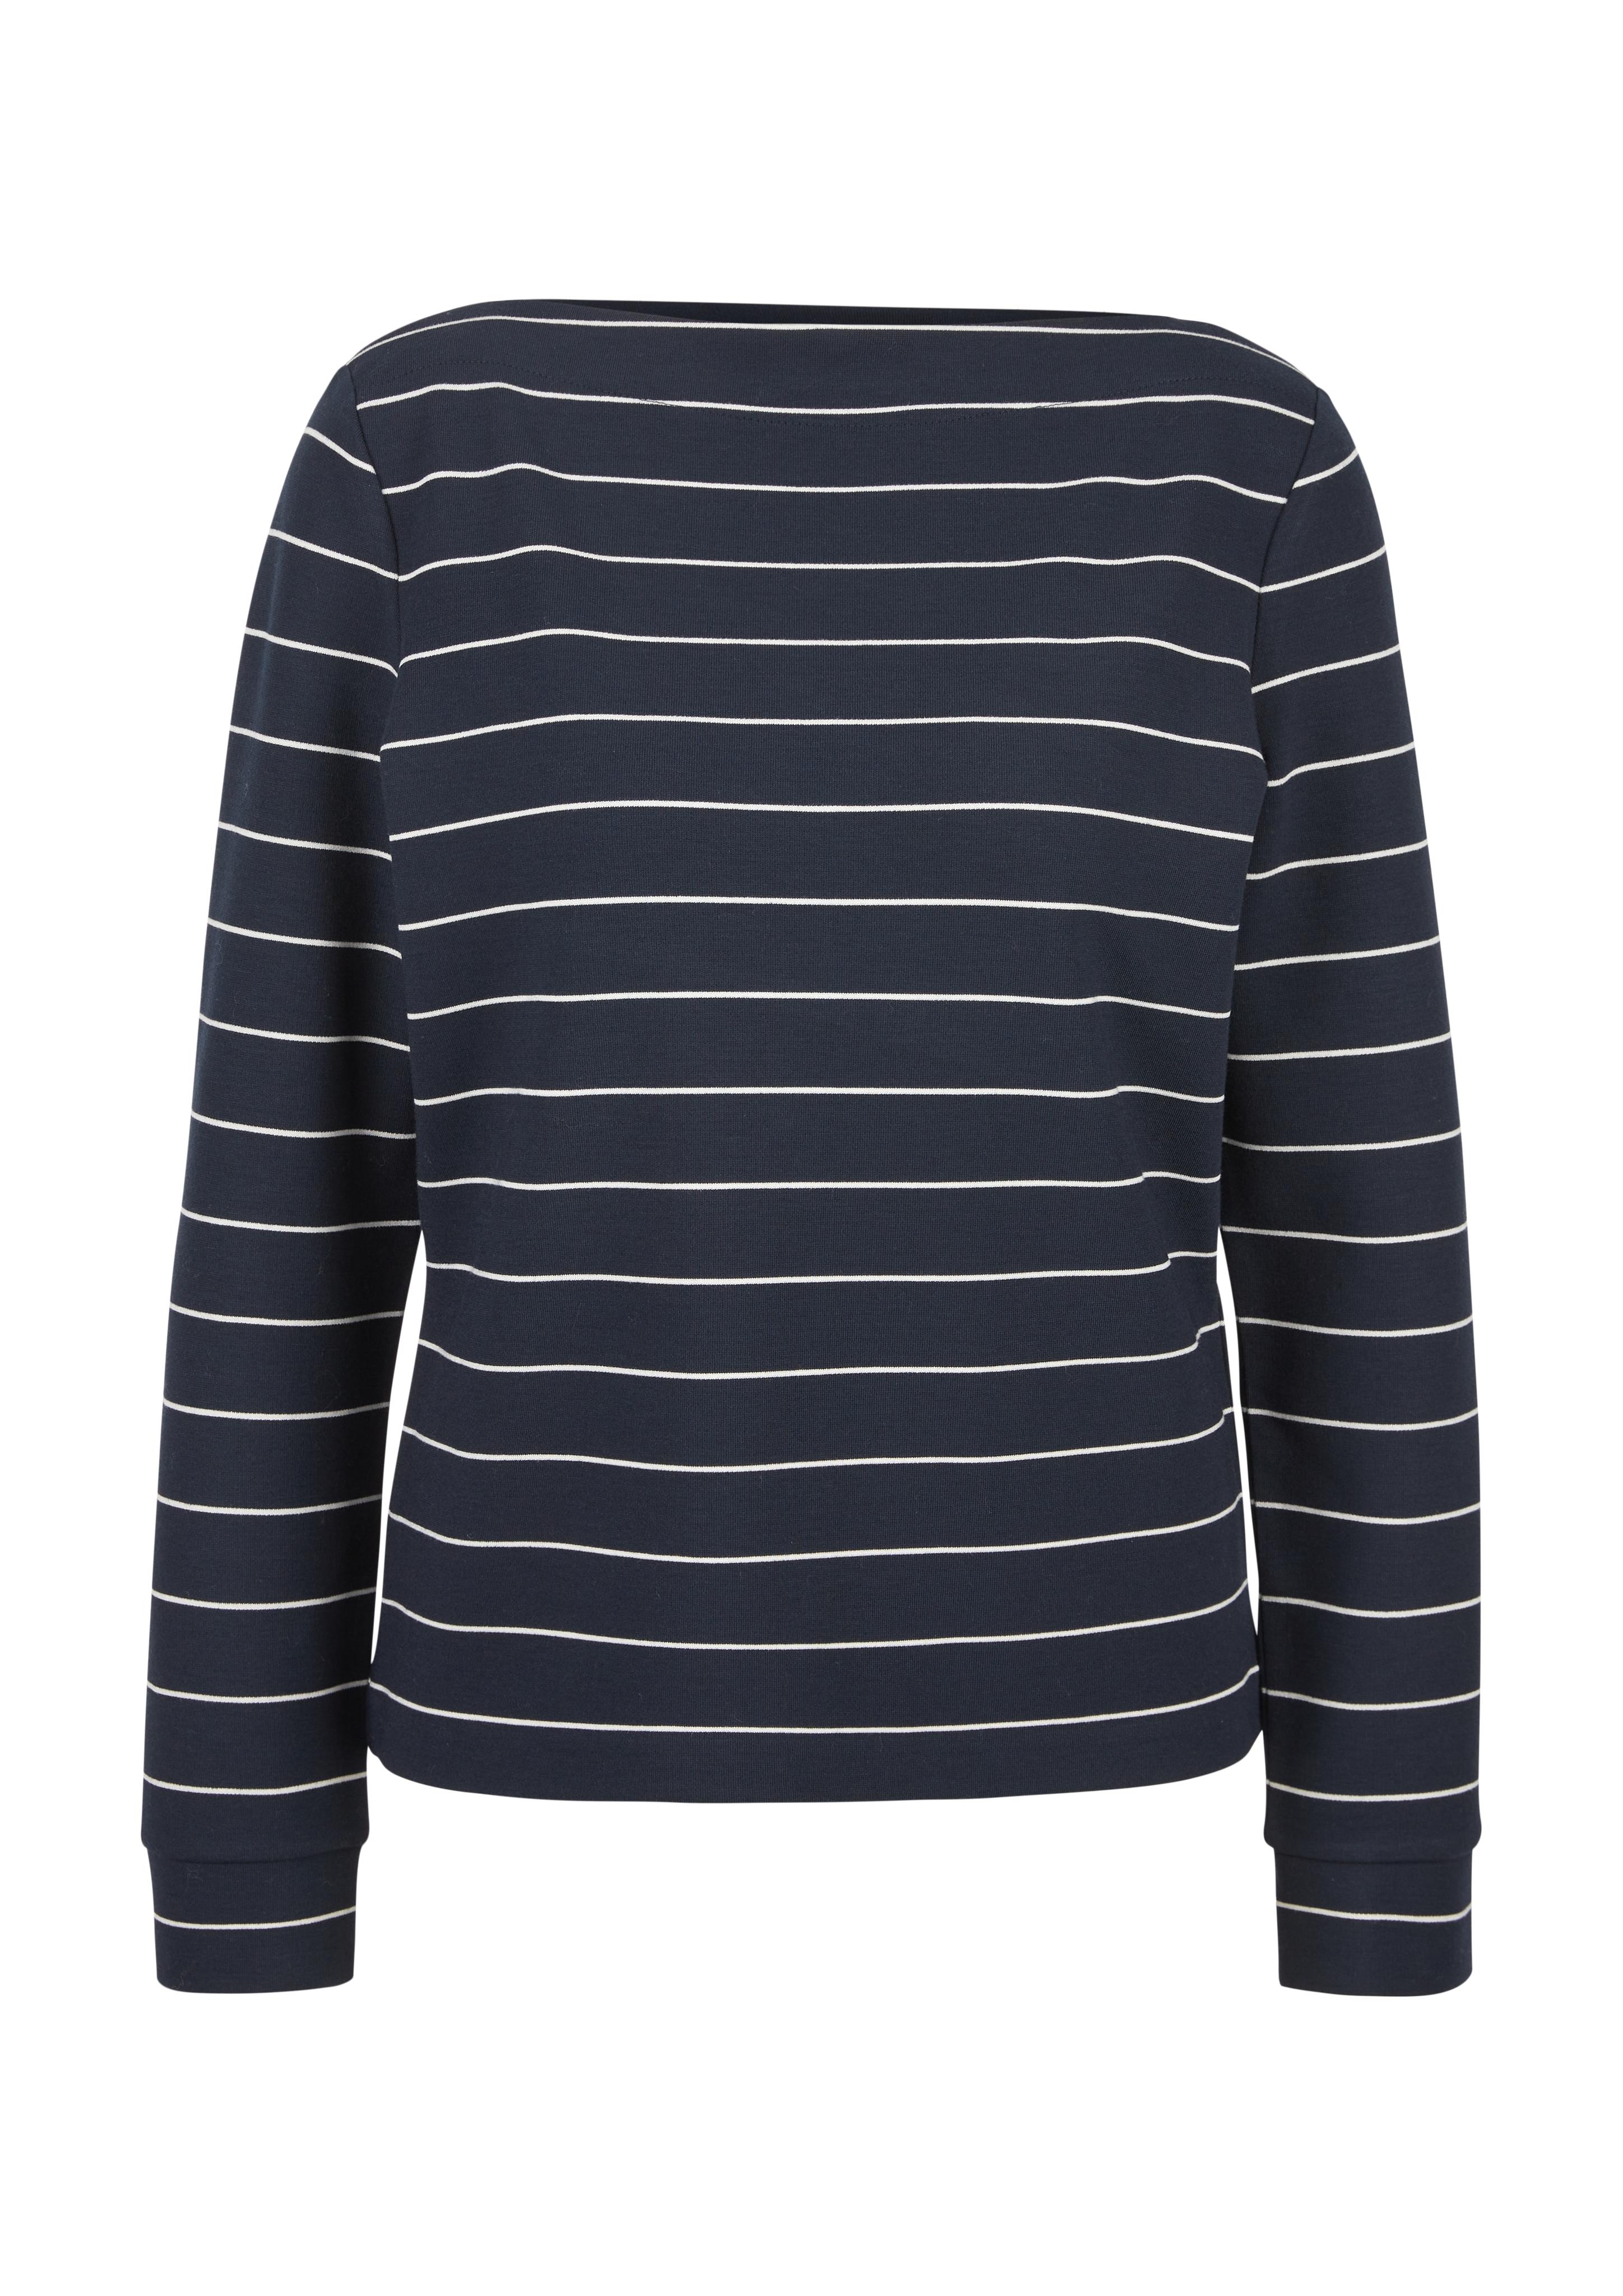 Interlockjersey-Shirt